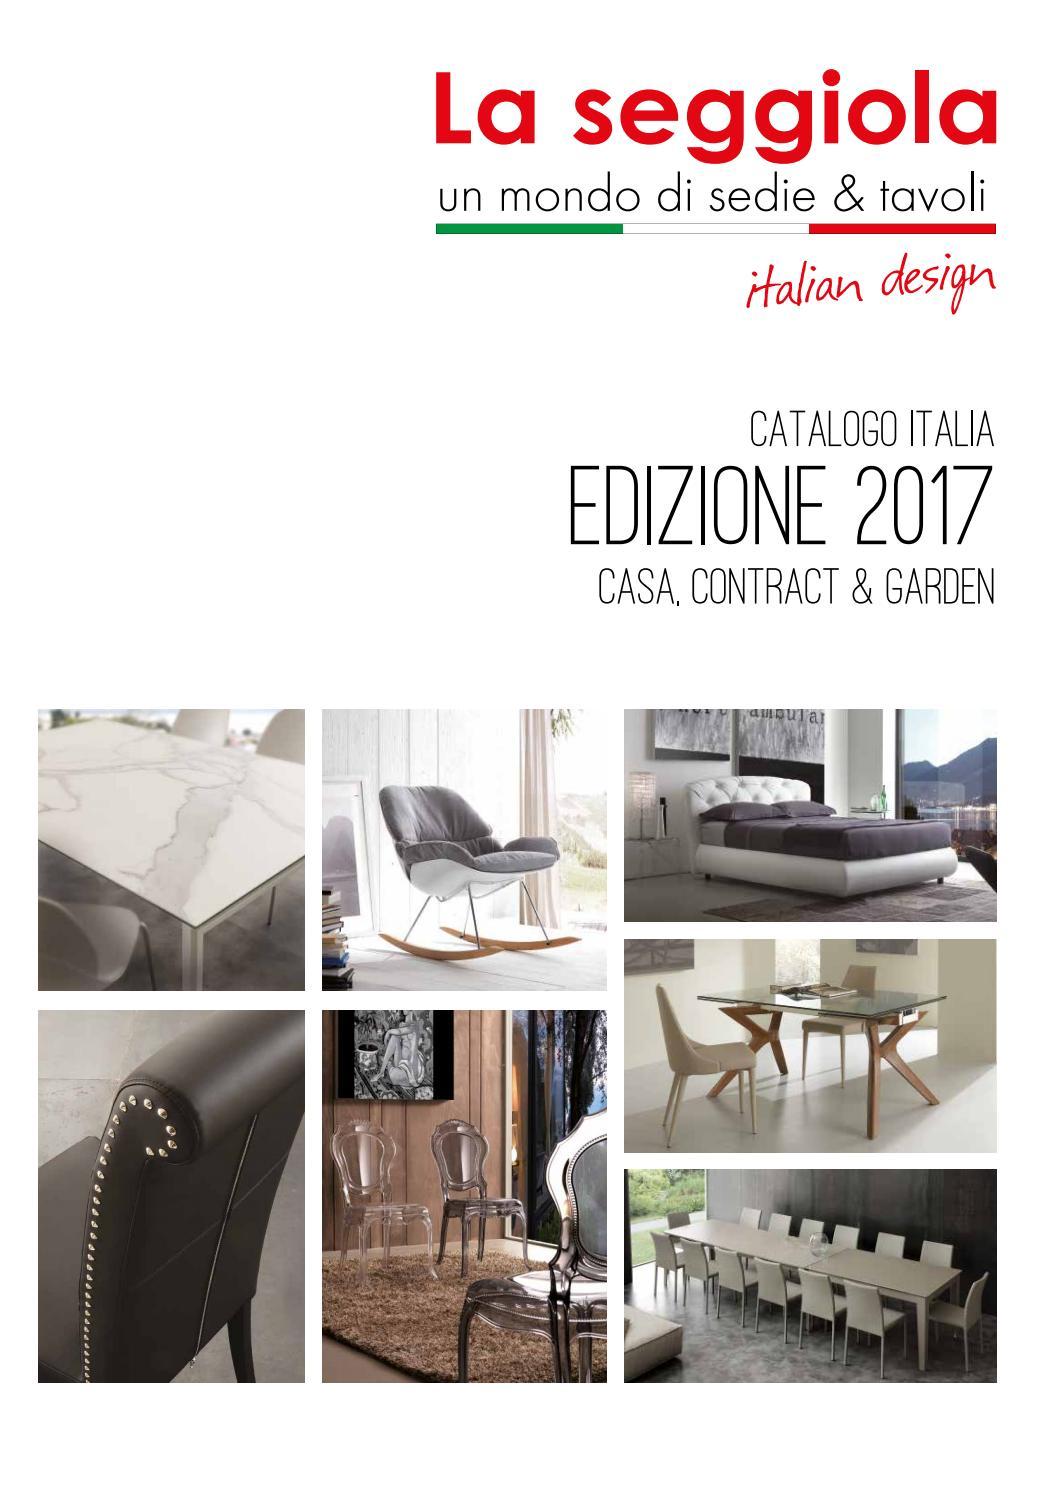 Catalogo La seggiola Tavoli e sedie moderno by ...